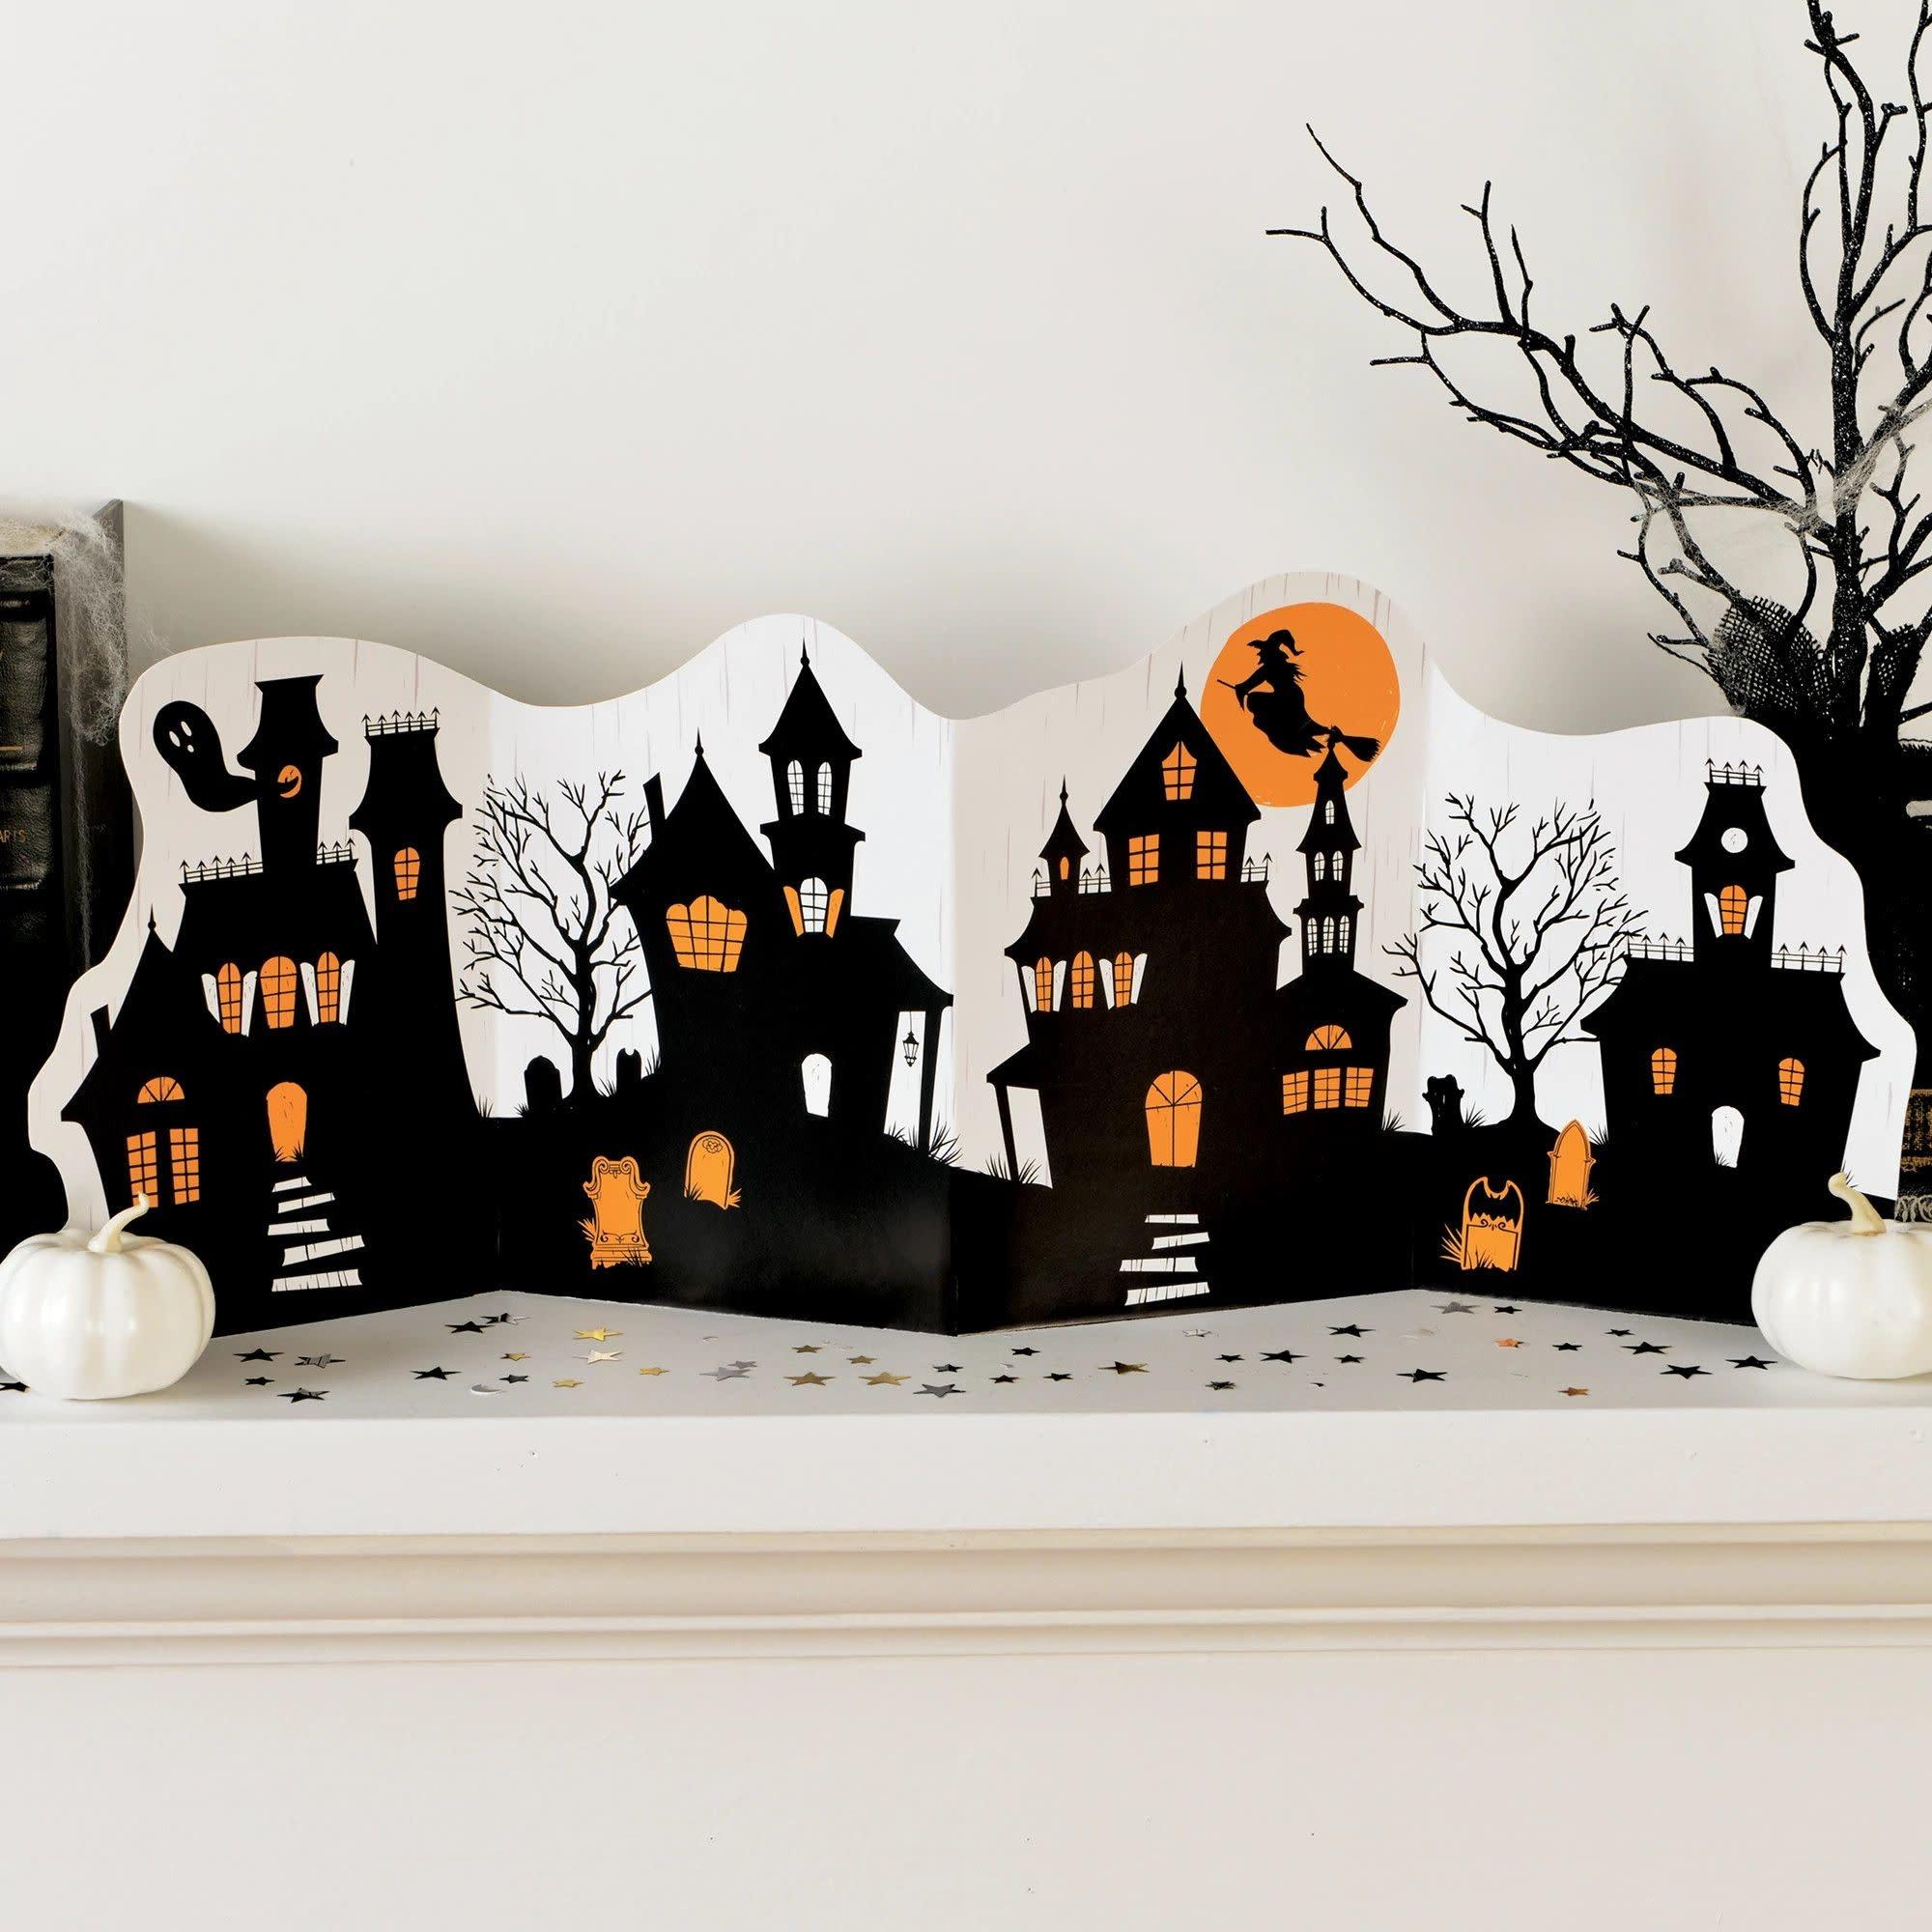 Classic Black & Orange Halloween Folded Accordian Centerpiece Decoration Kit